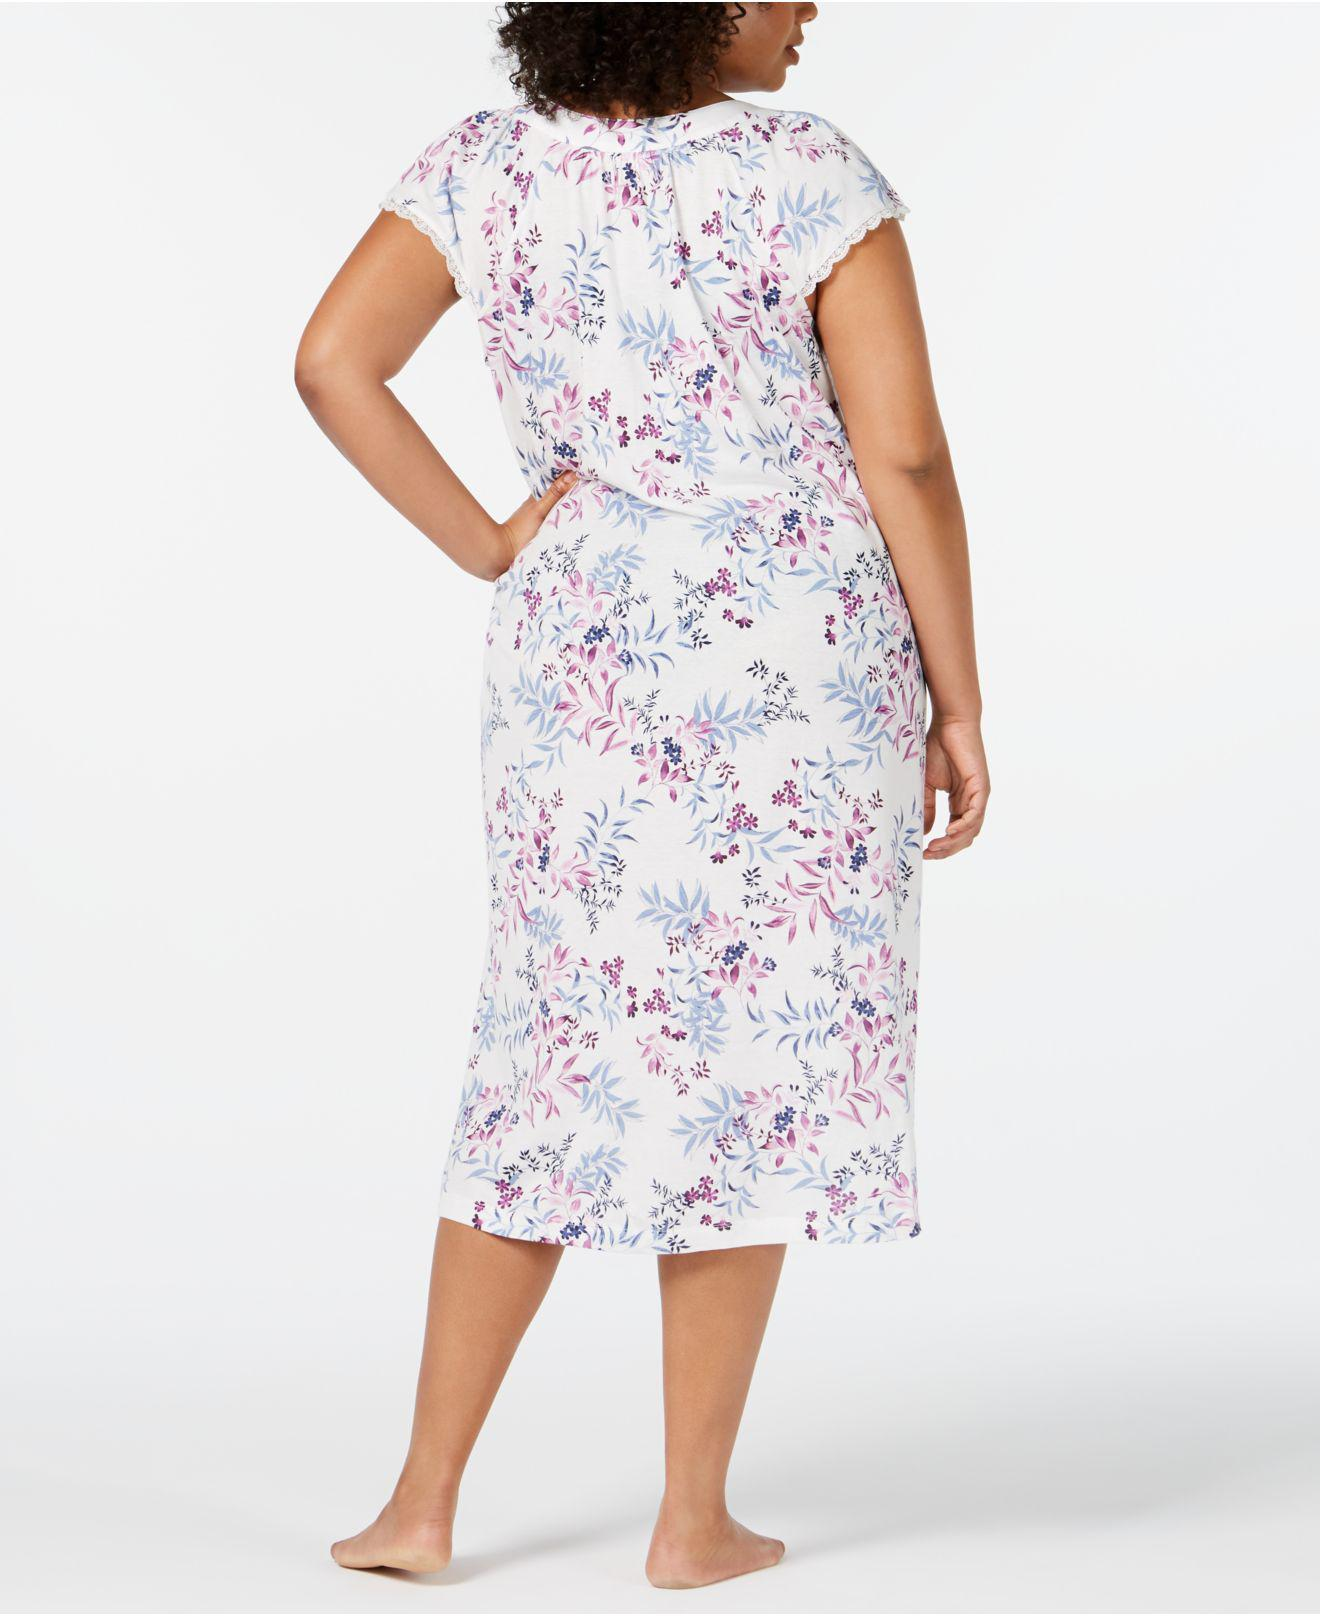 4b72572d1de Lyst - Charter Club Plus Size Flutter-sleeve Printed Knit Nightgown ...